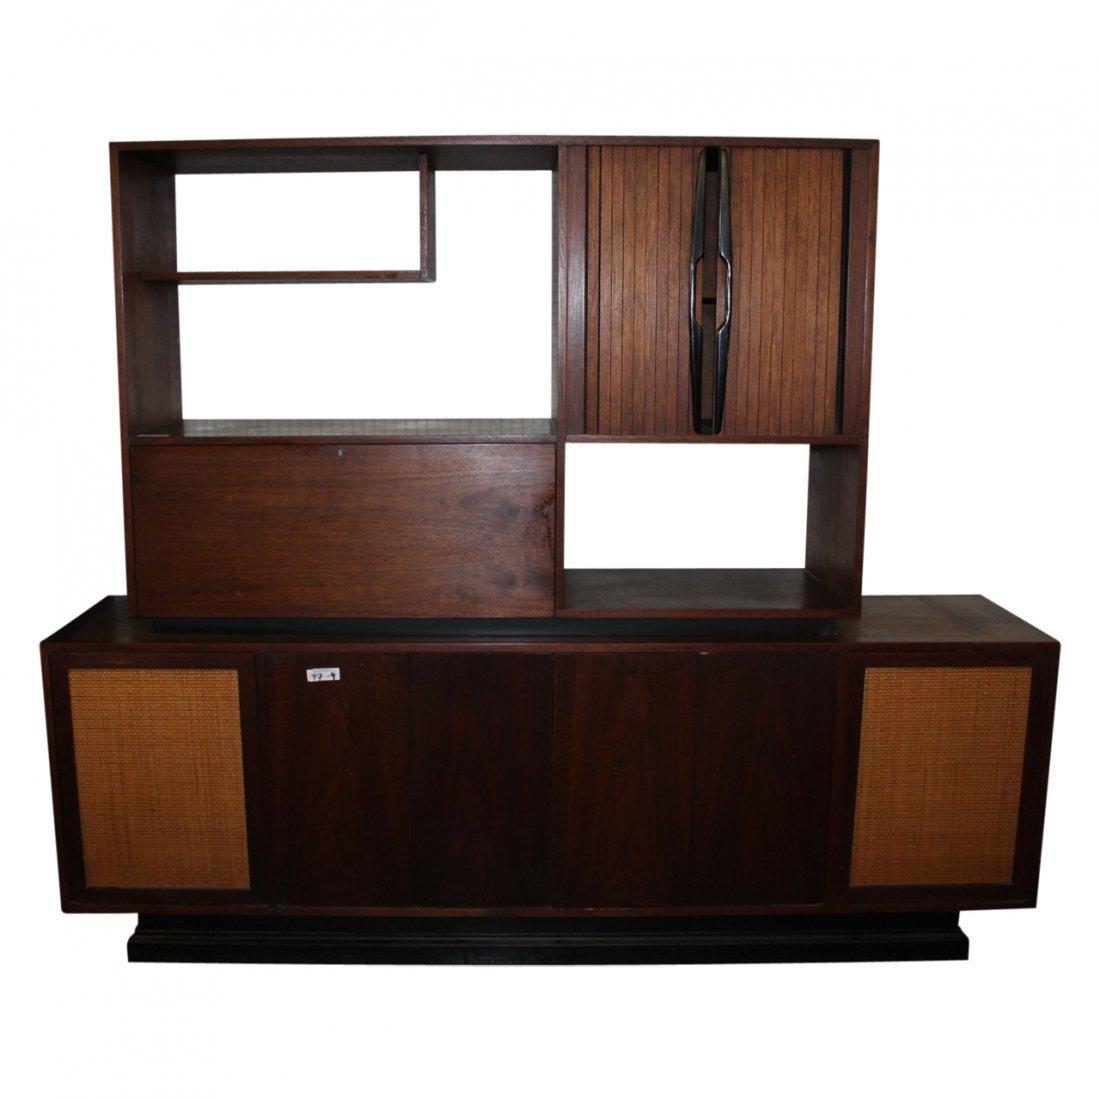 2 Part Mid Century Modern Shelf Unit with BAR